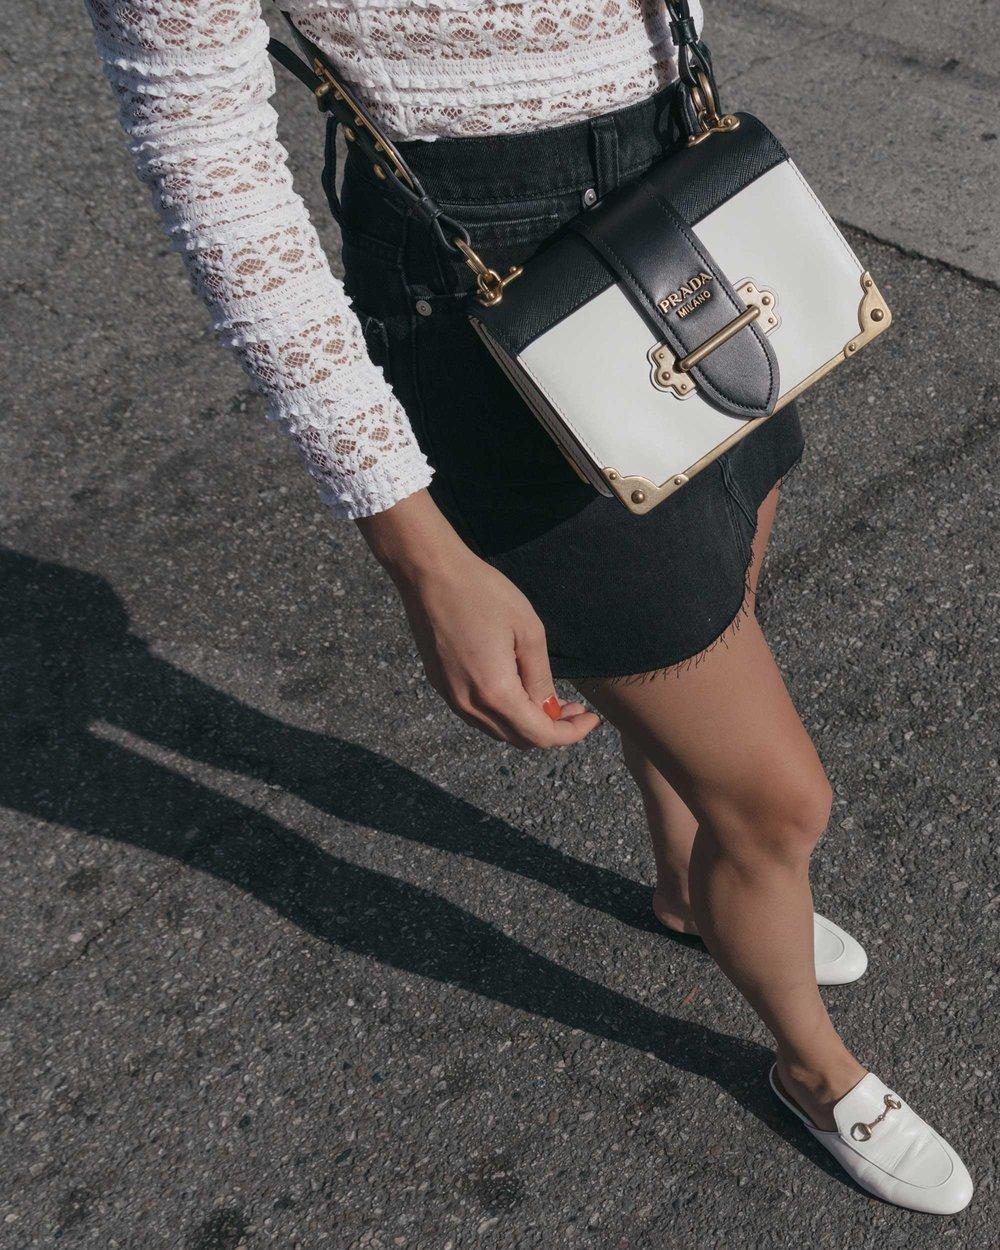 58d567cdf21c Prada Cahier Bag — Sarah Styles Seattle